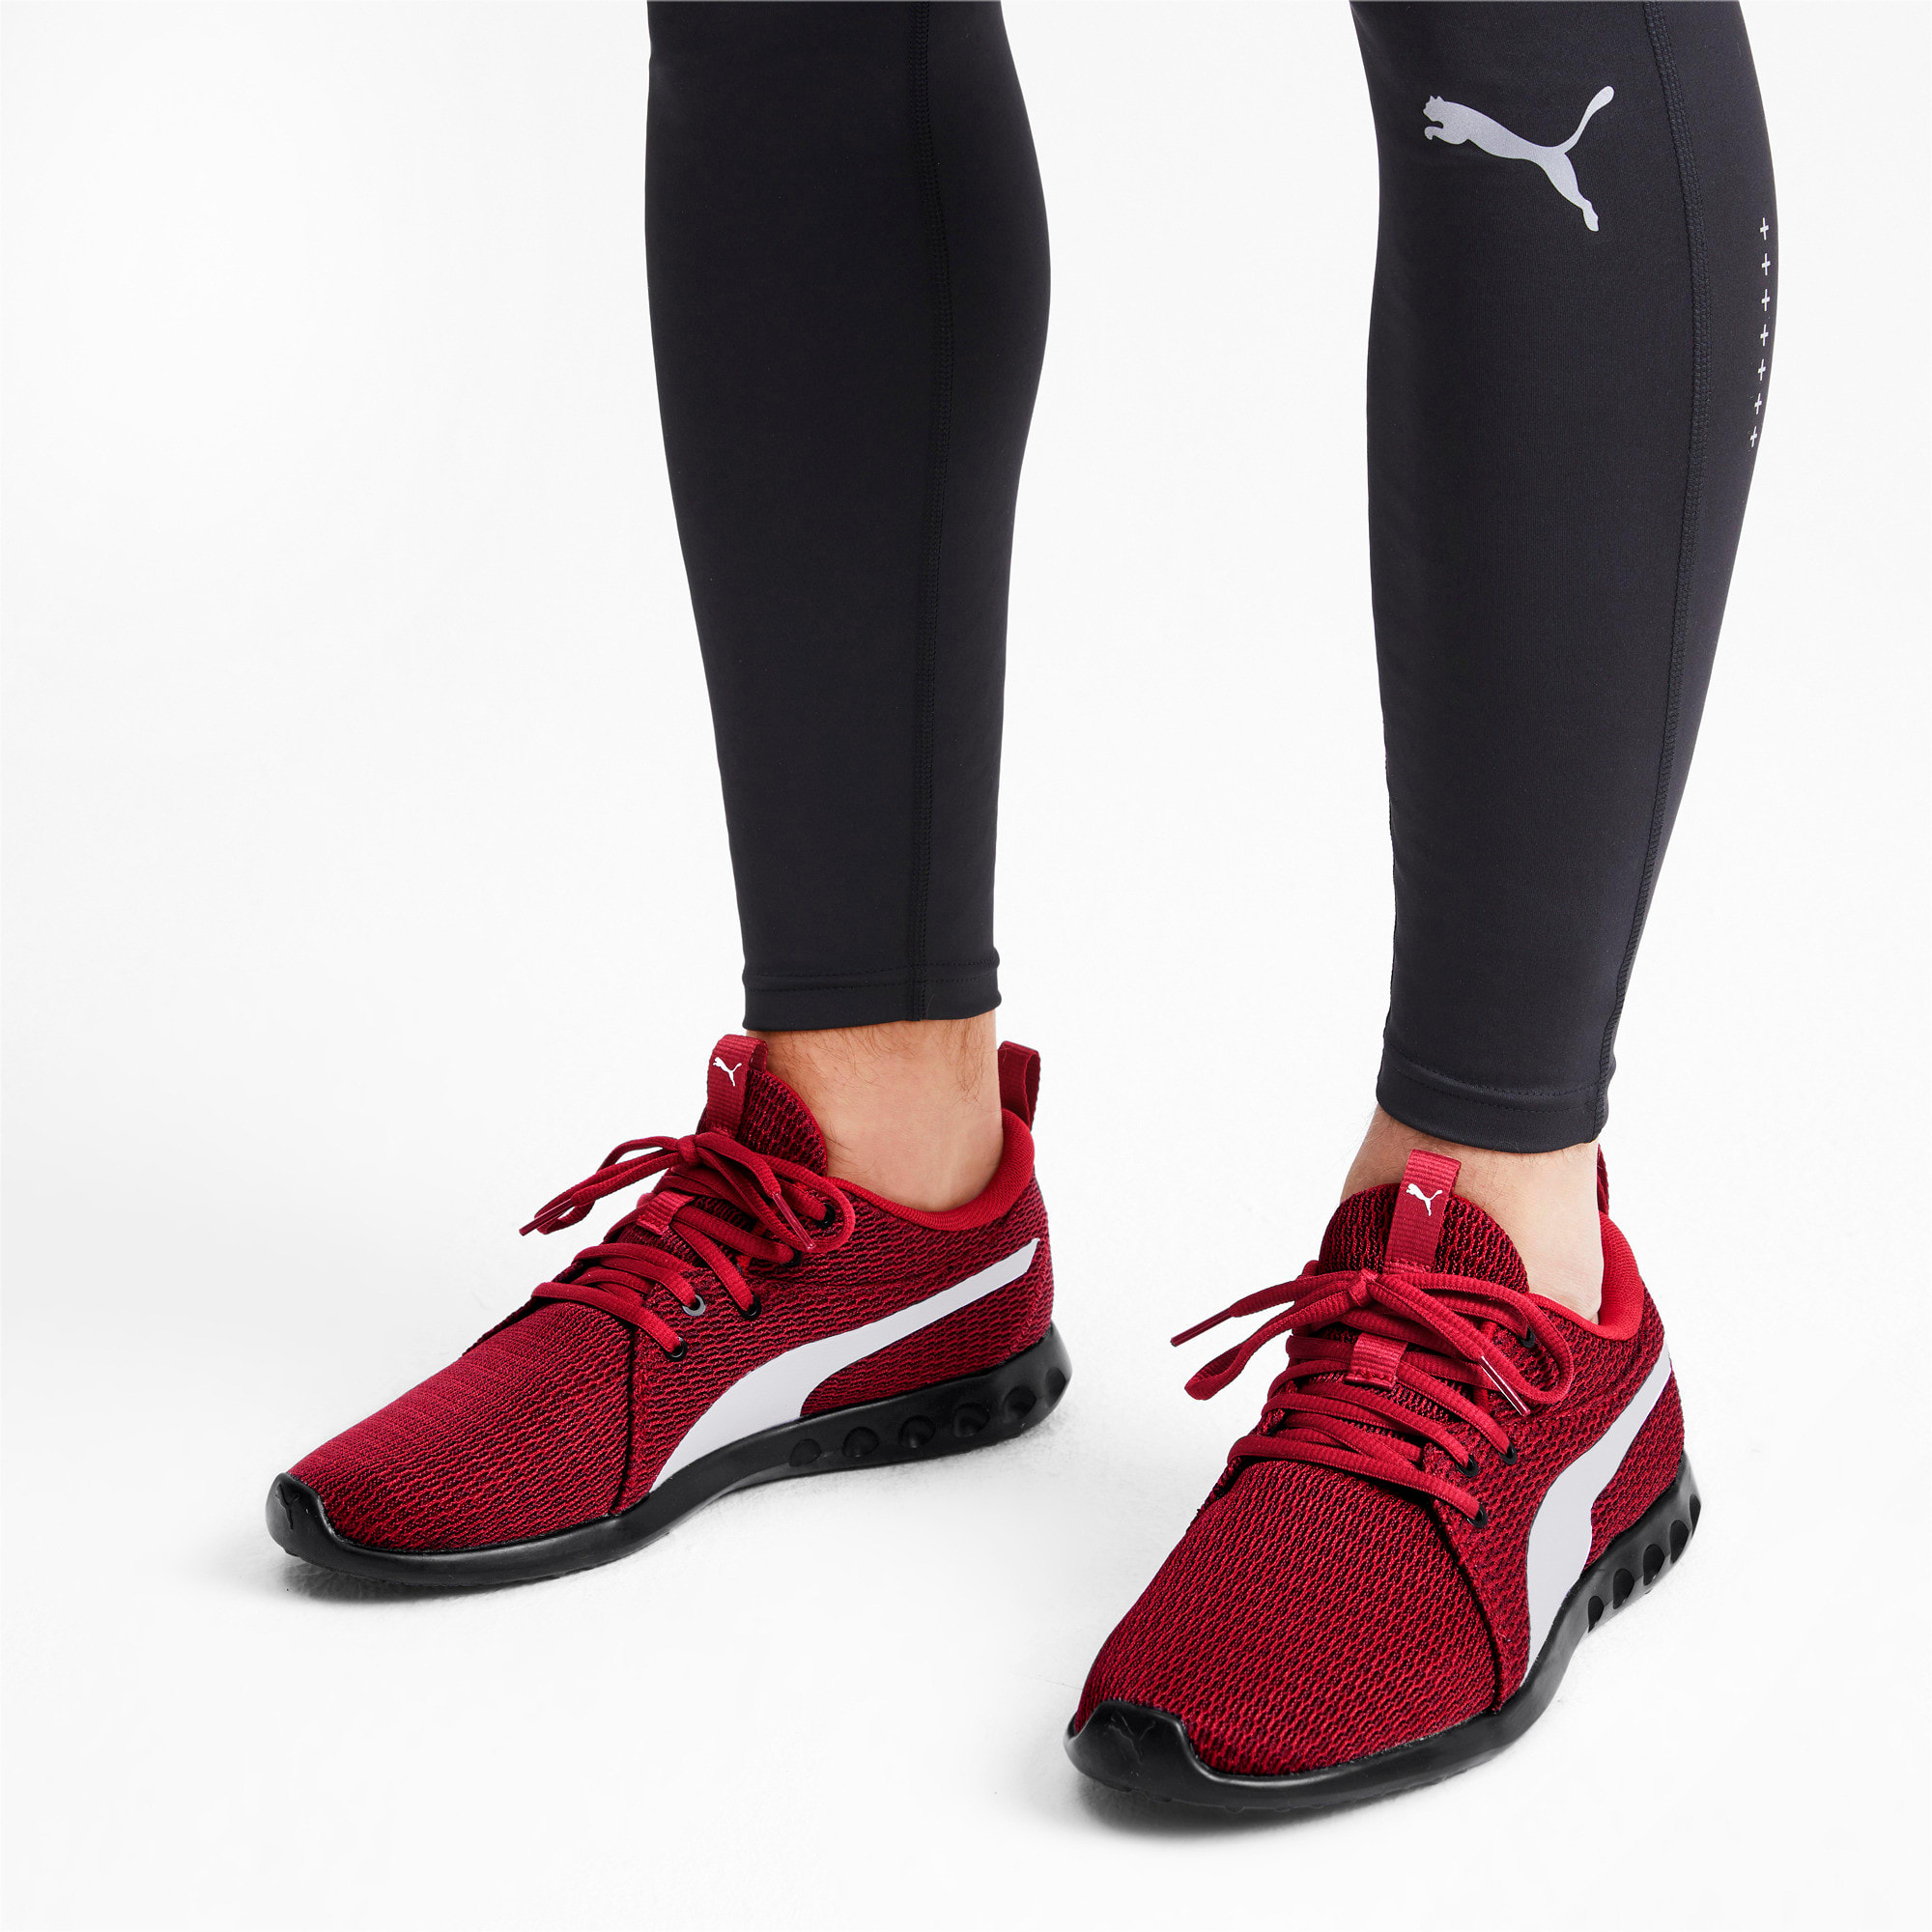 Thumbnail 3 of Carson 2 New Core Men's Running Shoes, Rhubarb-White-Black, medium